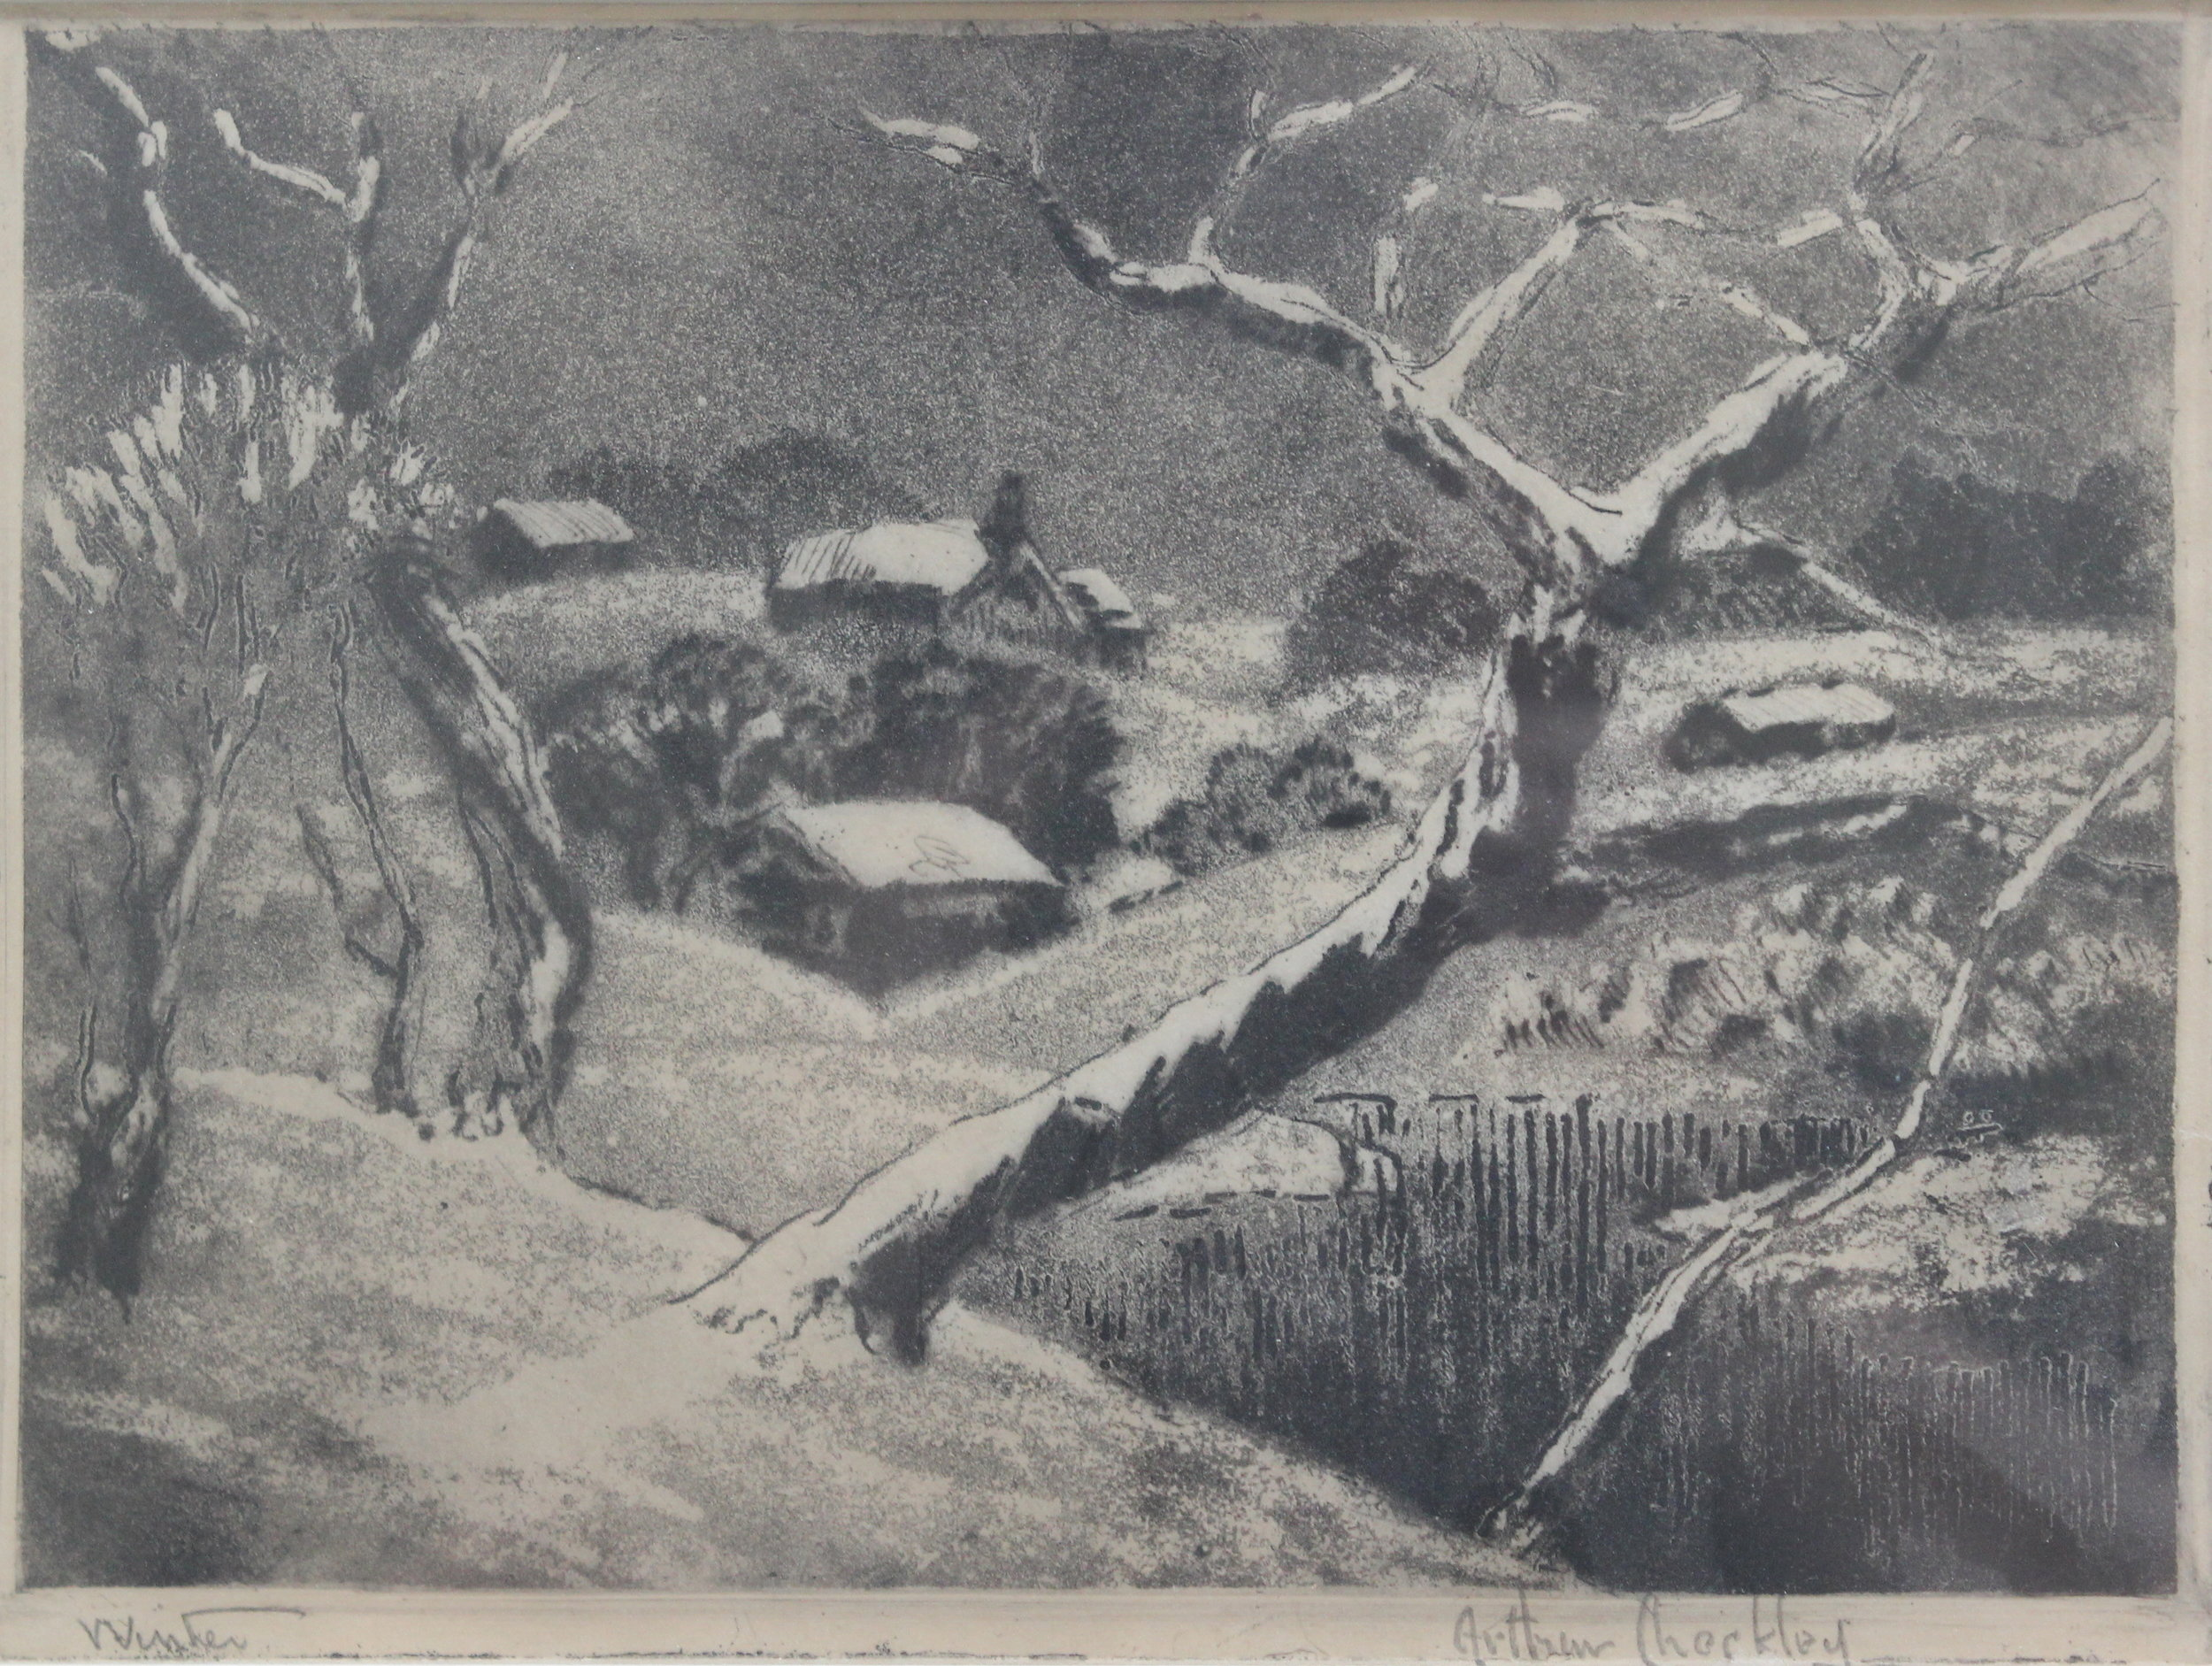 Arthur Checkley, Winter